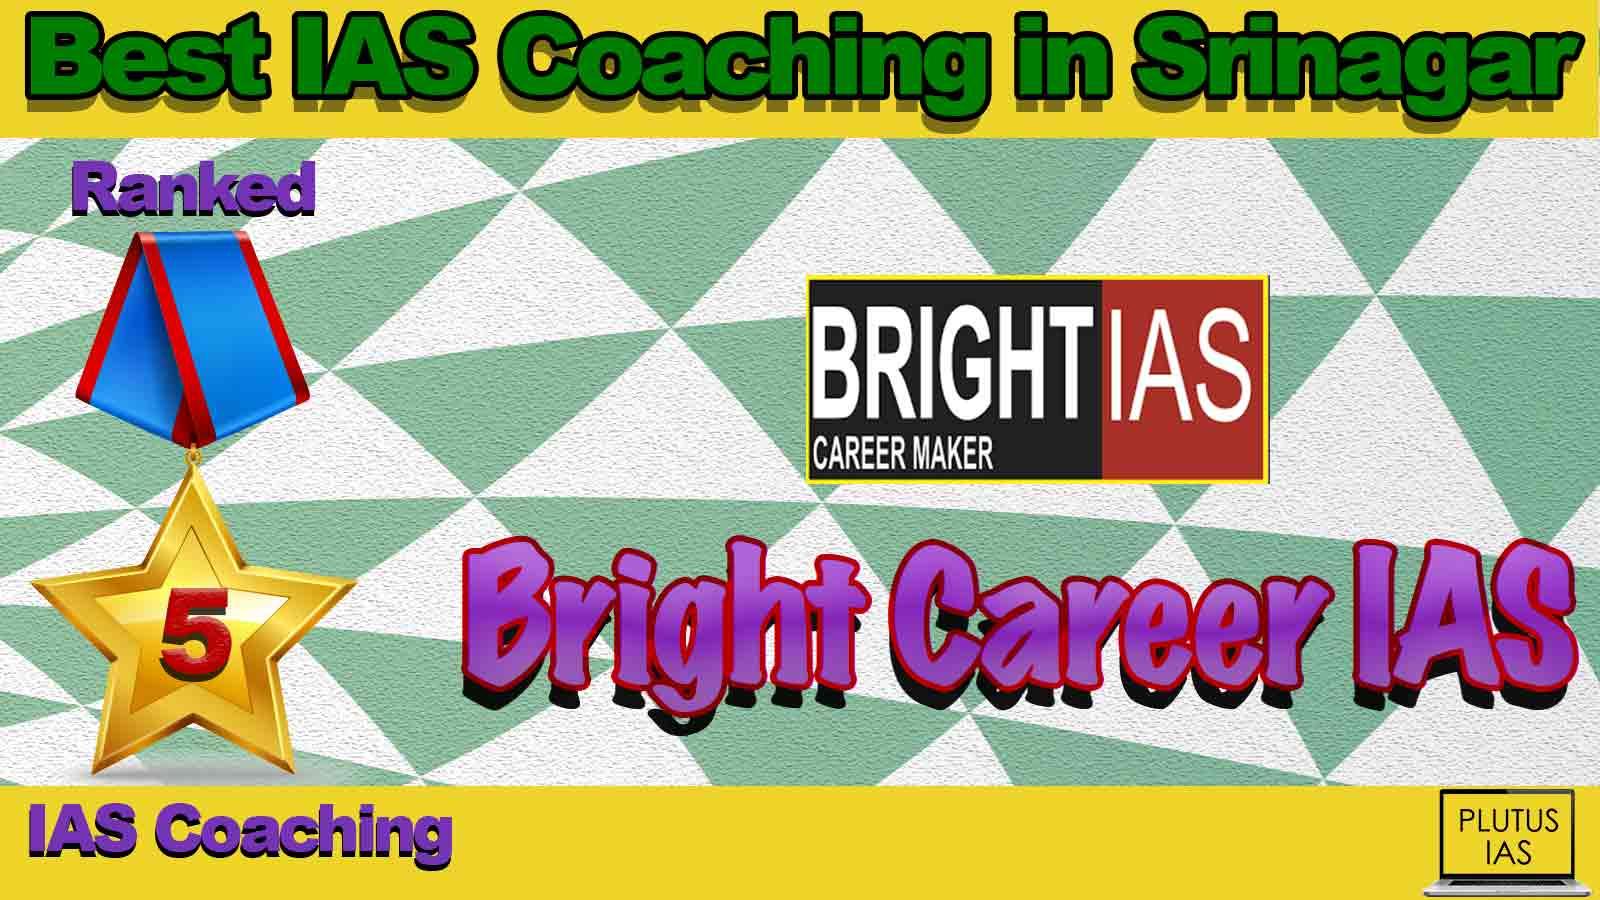 Best IAS Coaching in Srinagar